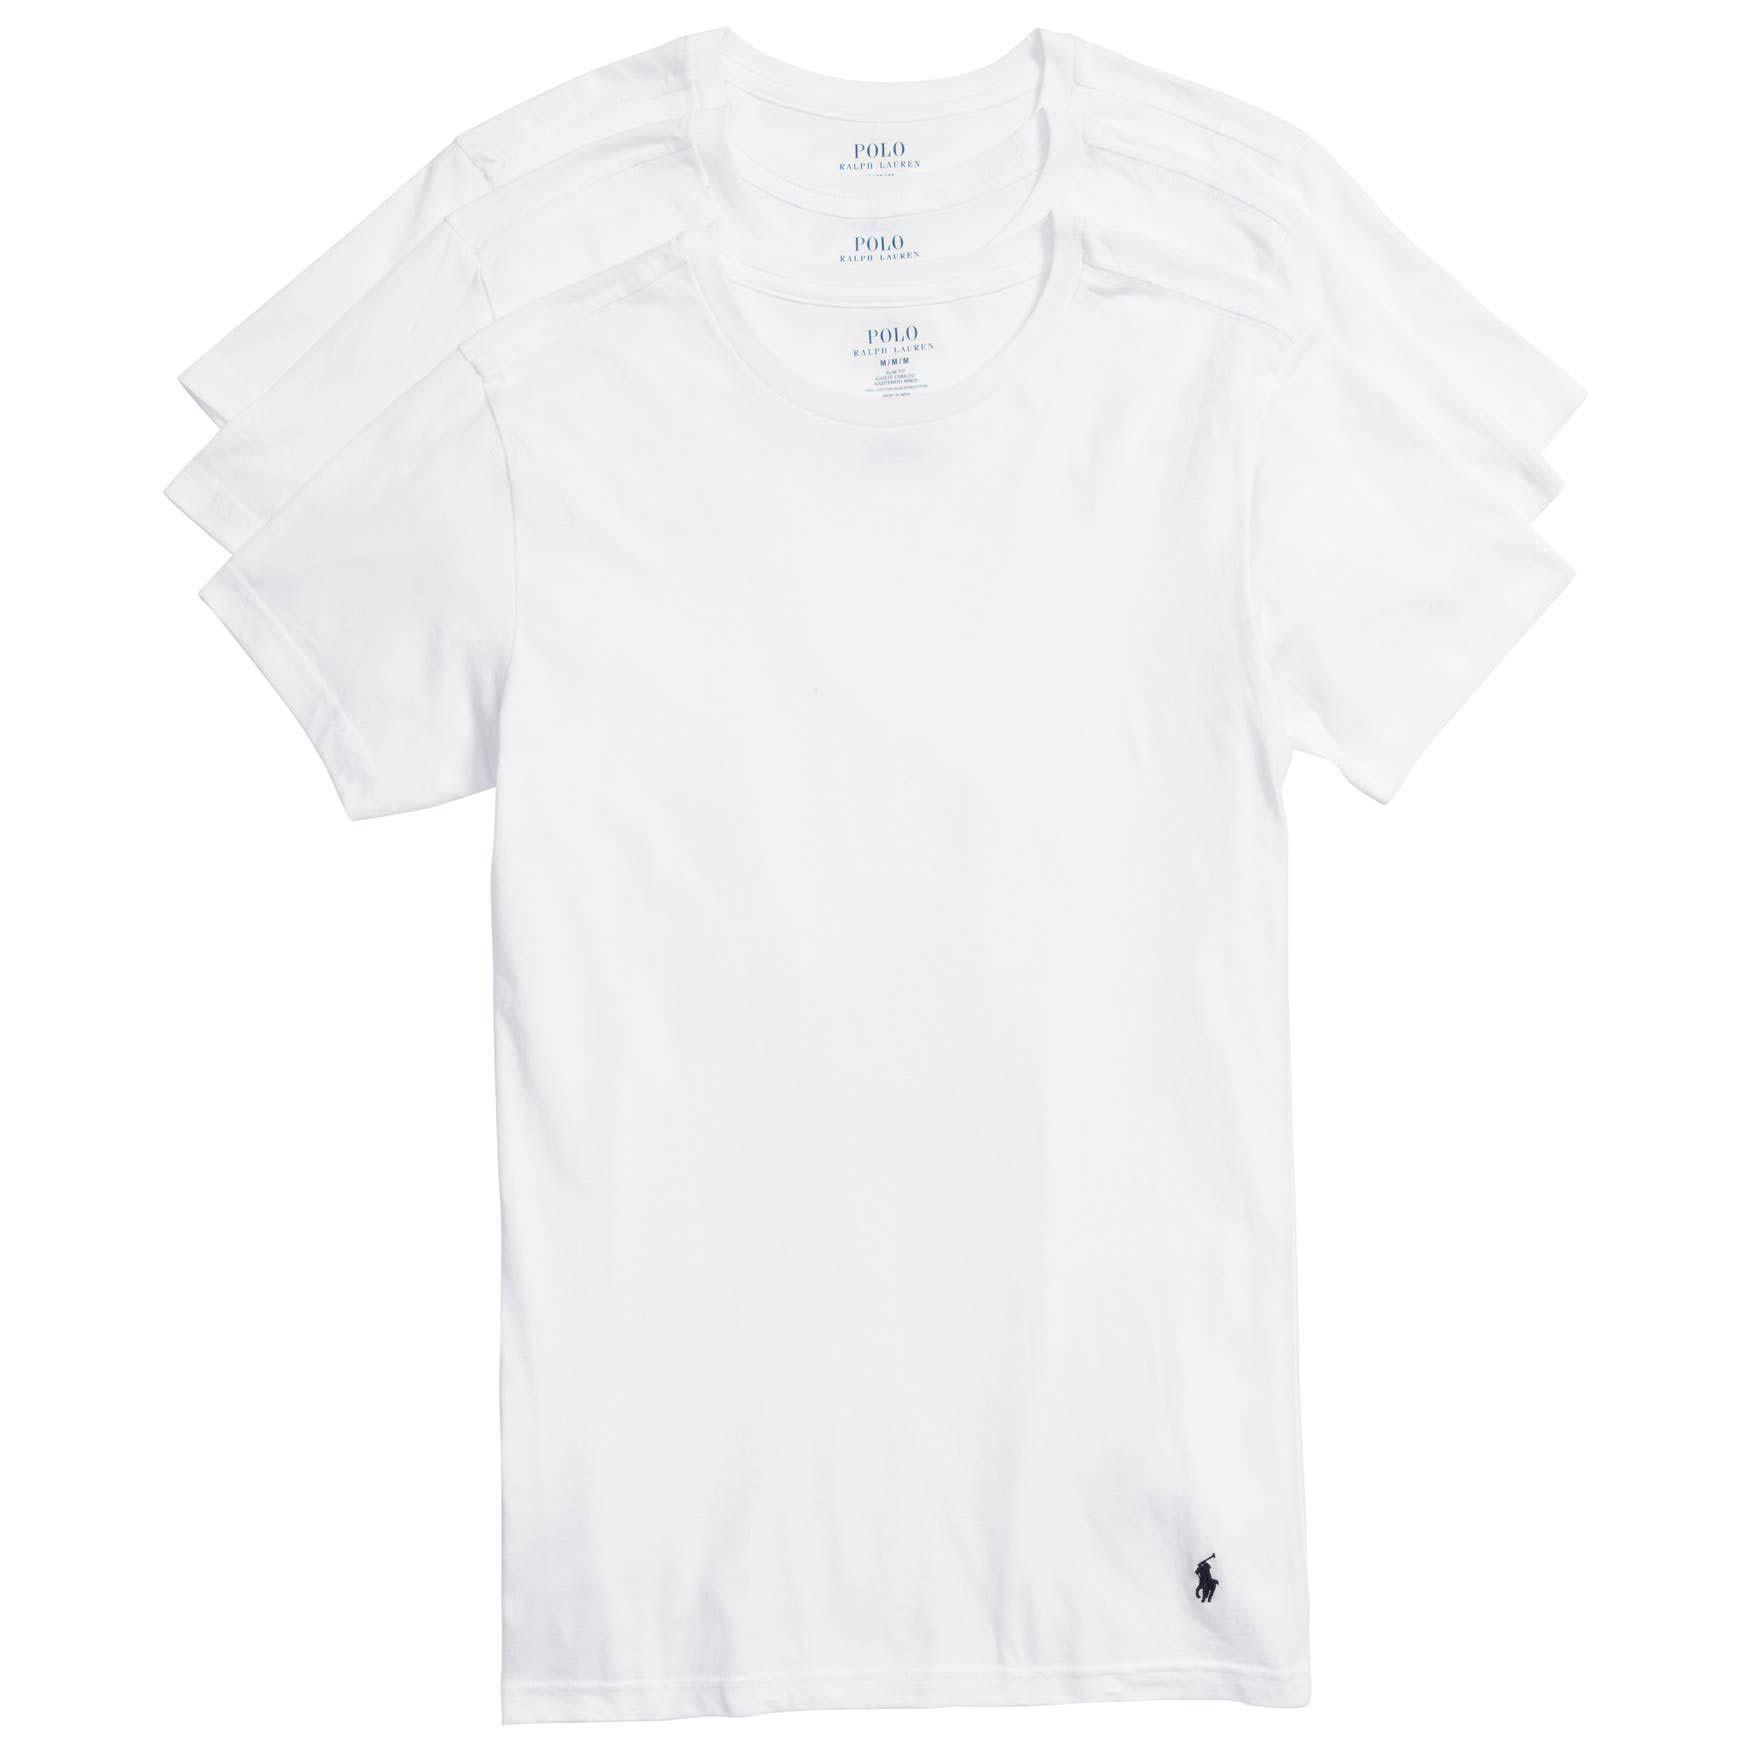 14 Best Undershirts for Men 2021